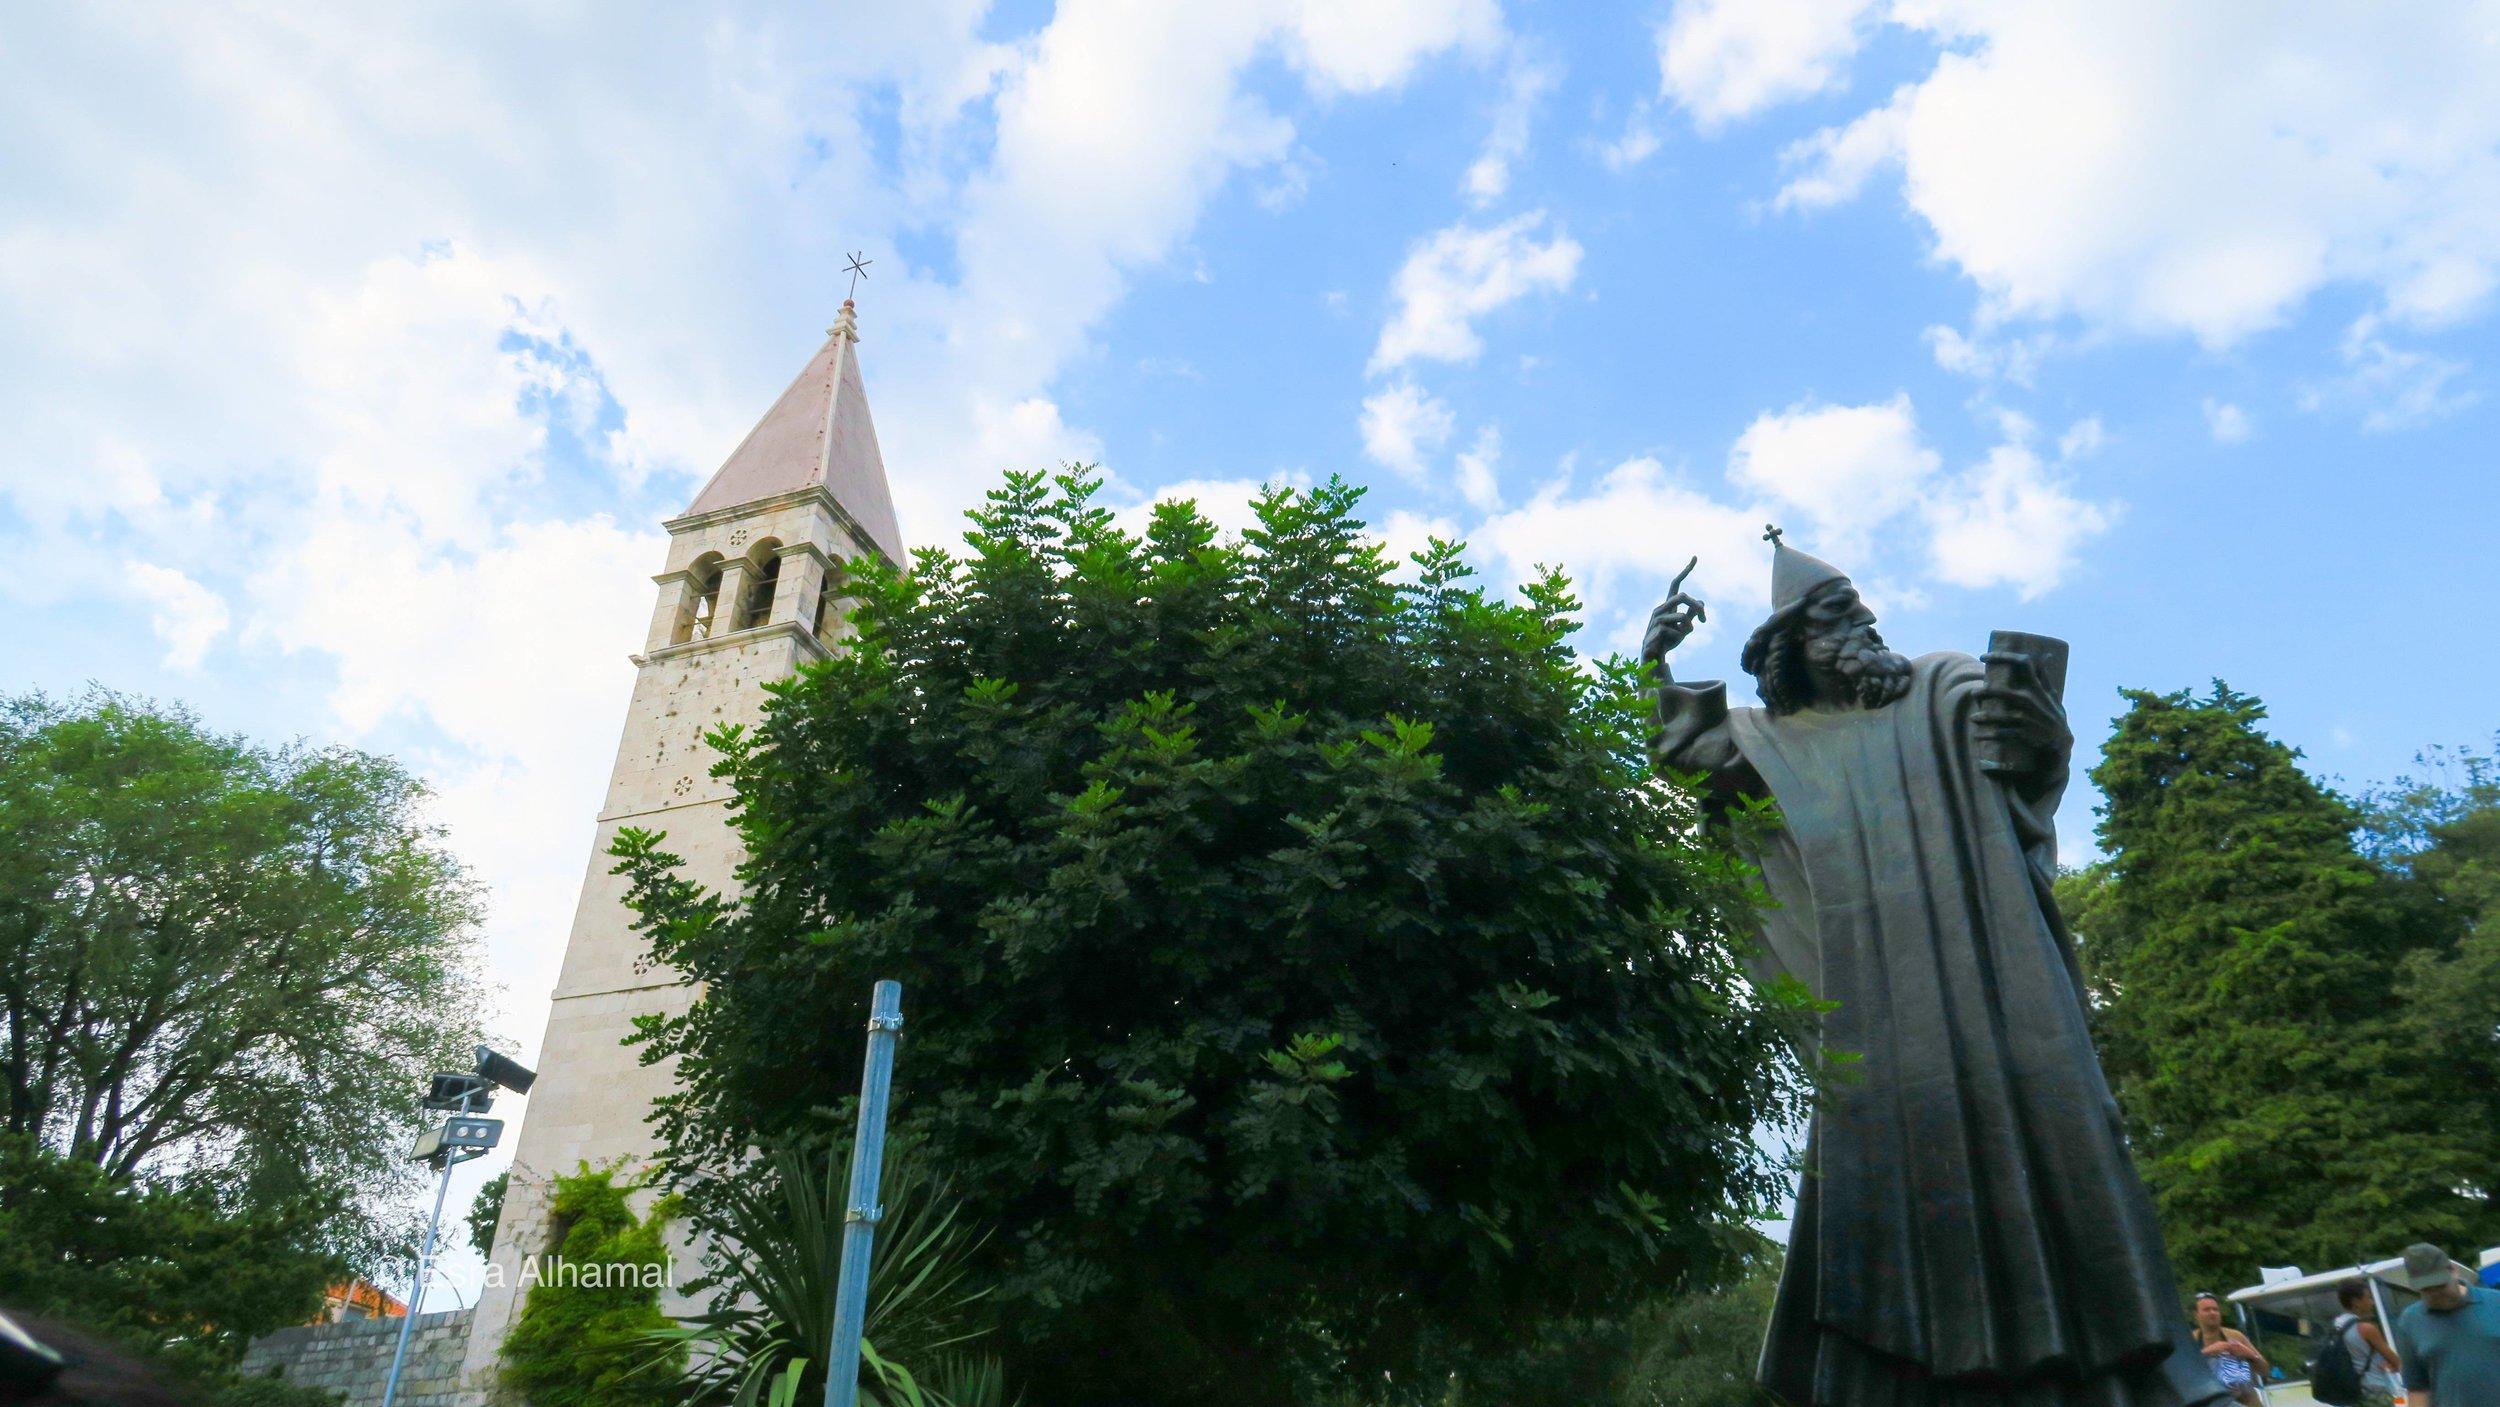 Statue of Grgur Ninski